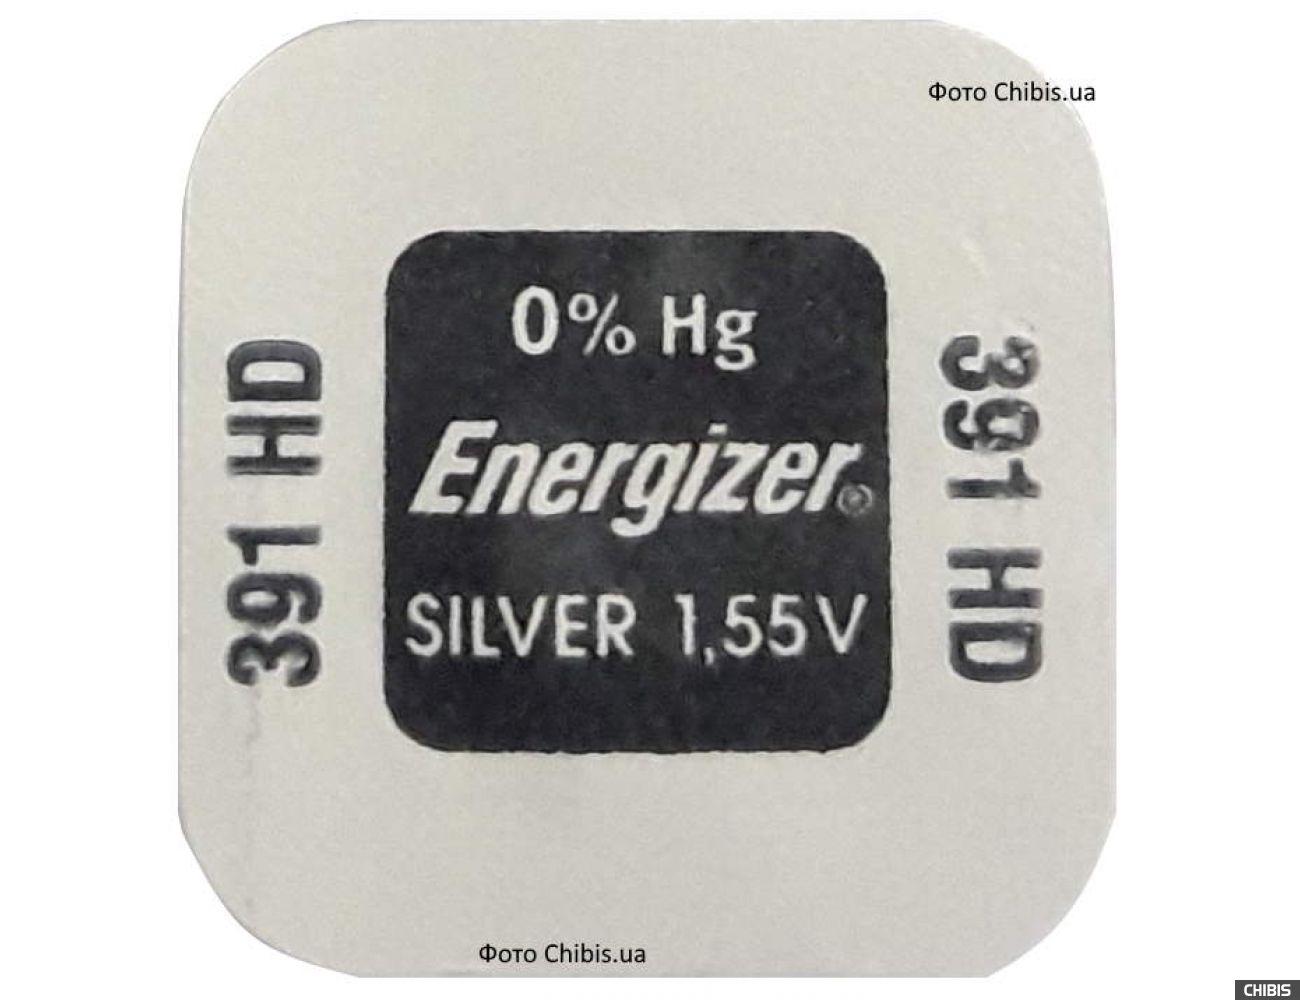 Батарейка 1120 Energizer 391 Silver Oxide 1.55V 1 шт.